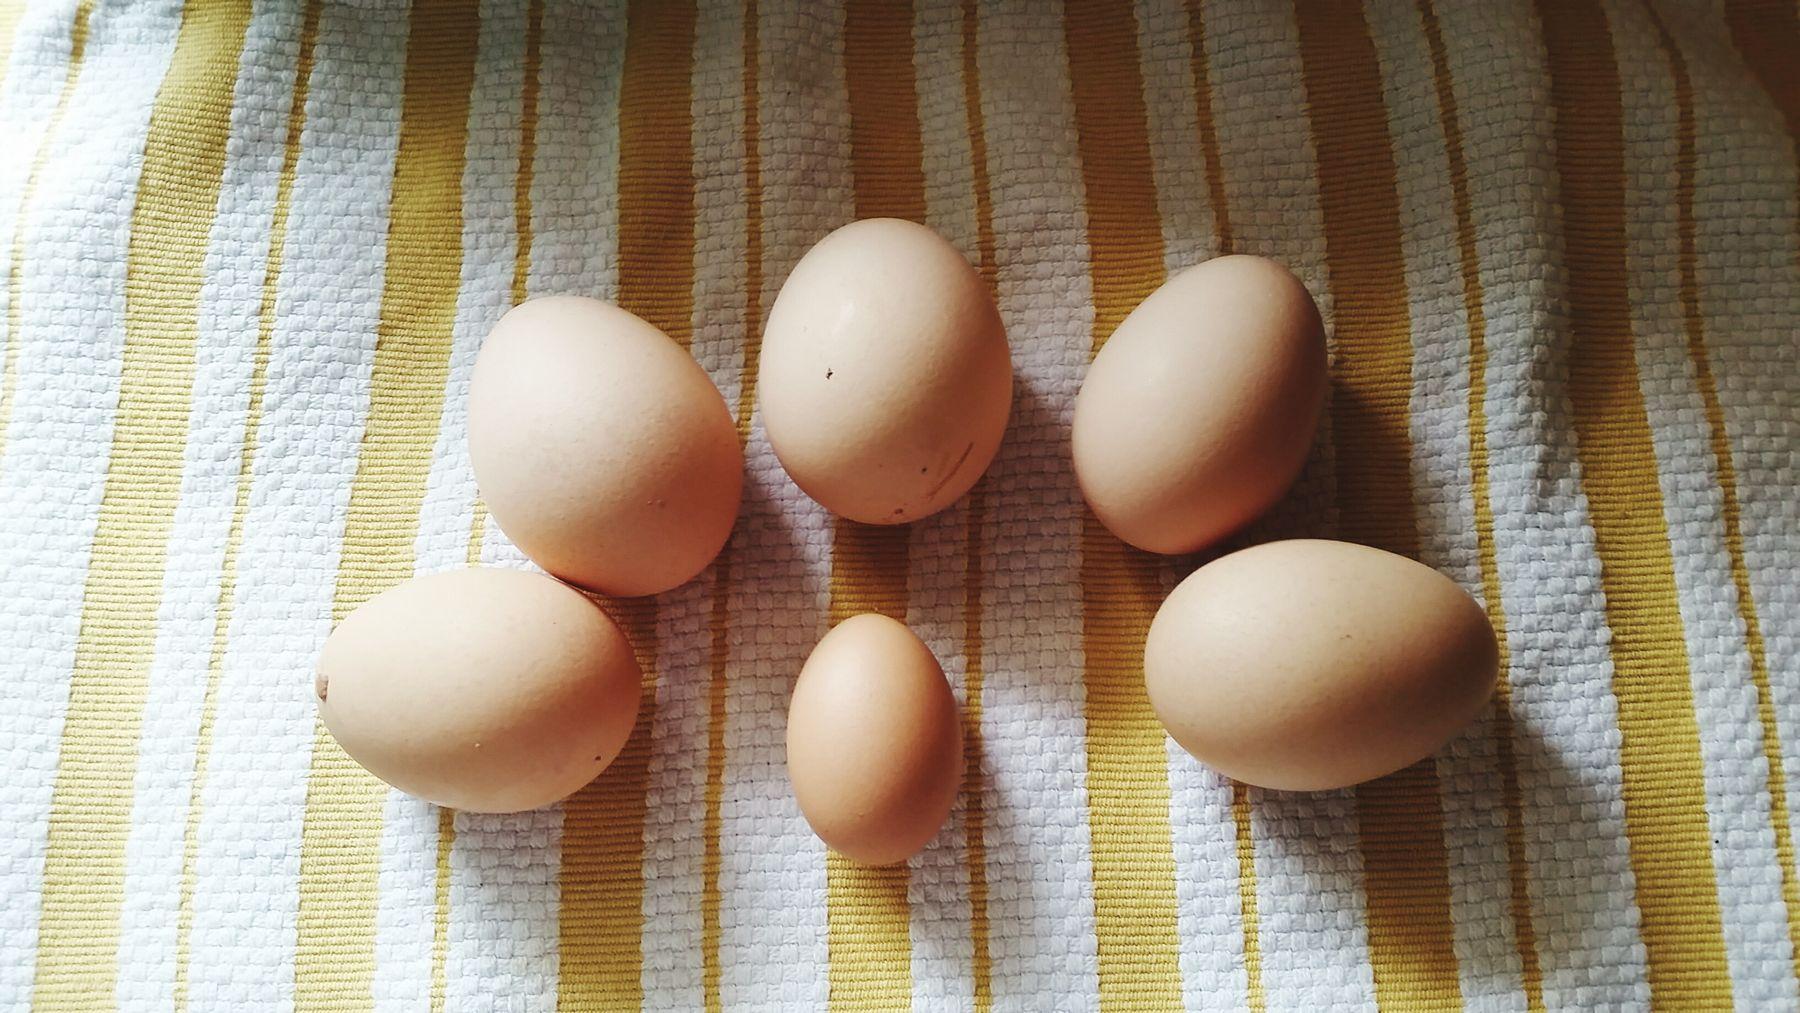 FRESHEGGS Babyegg Backyardchickens